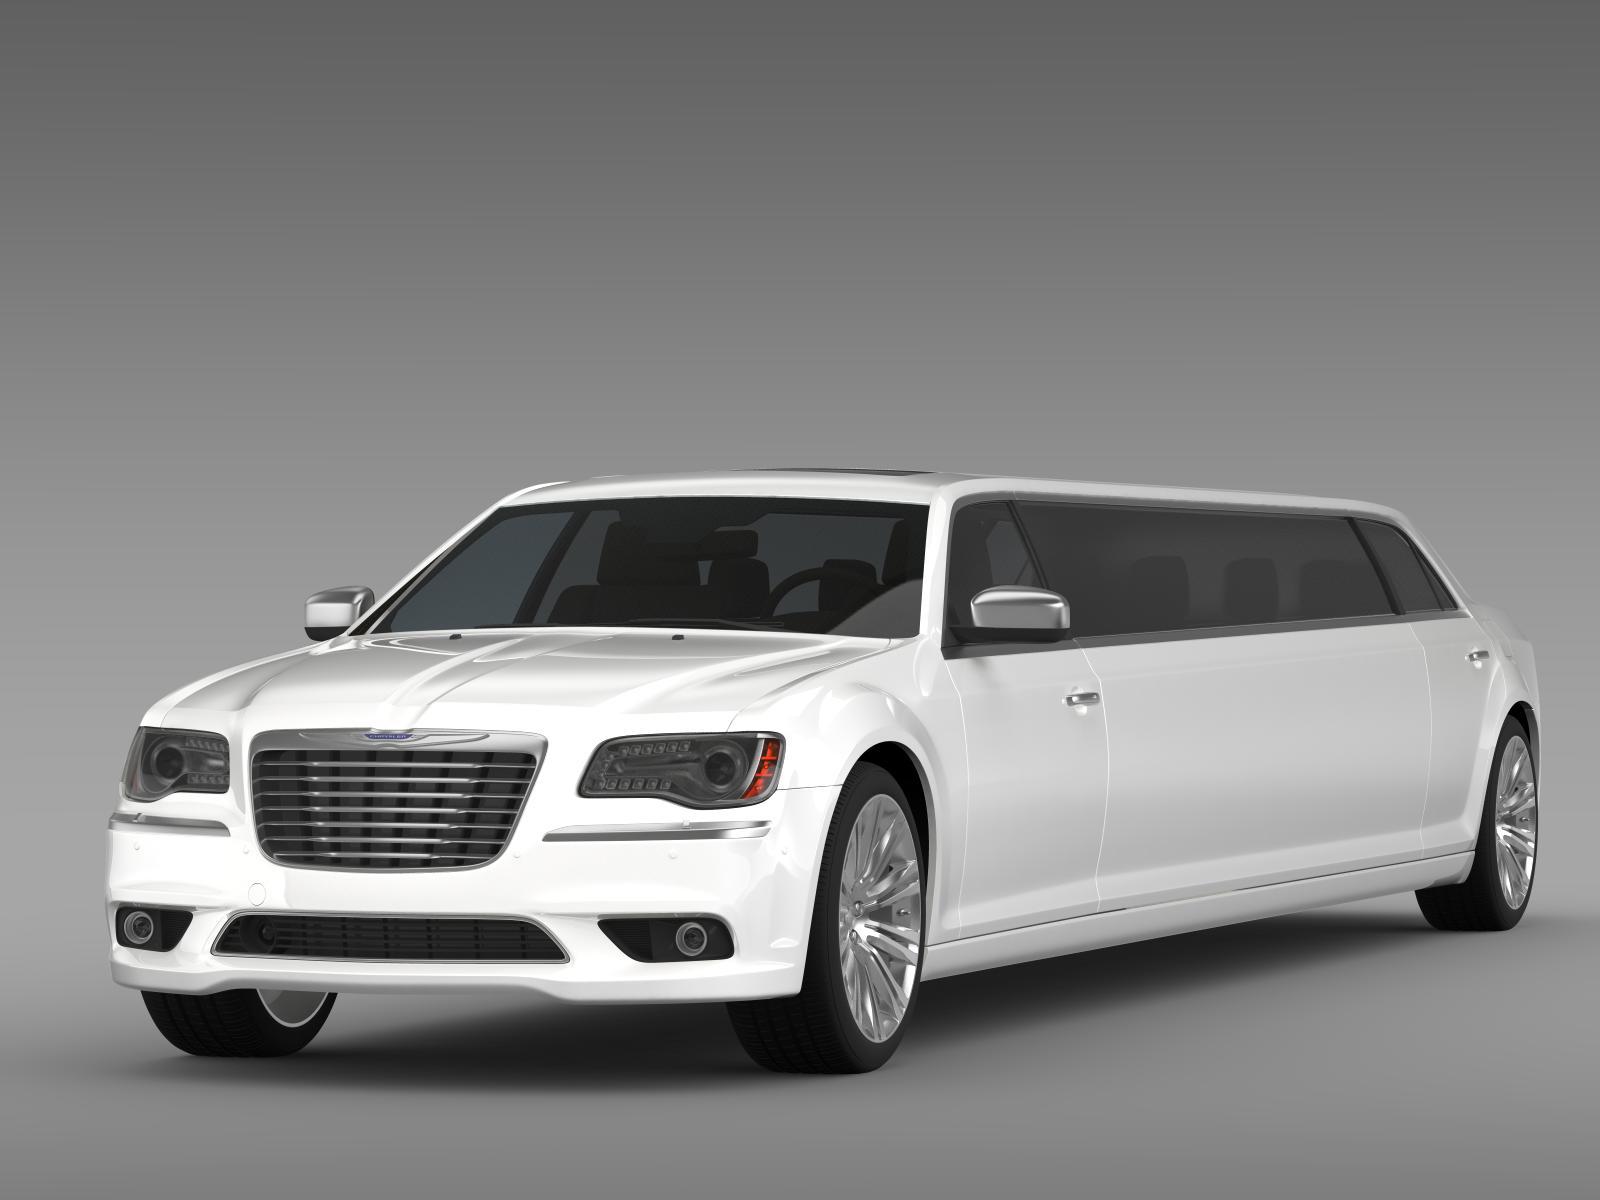 chrysler 300c 2013 limousine 3d model buy chrysler 300c. Black Bedroom Furniture Sets. Home Design Ideas